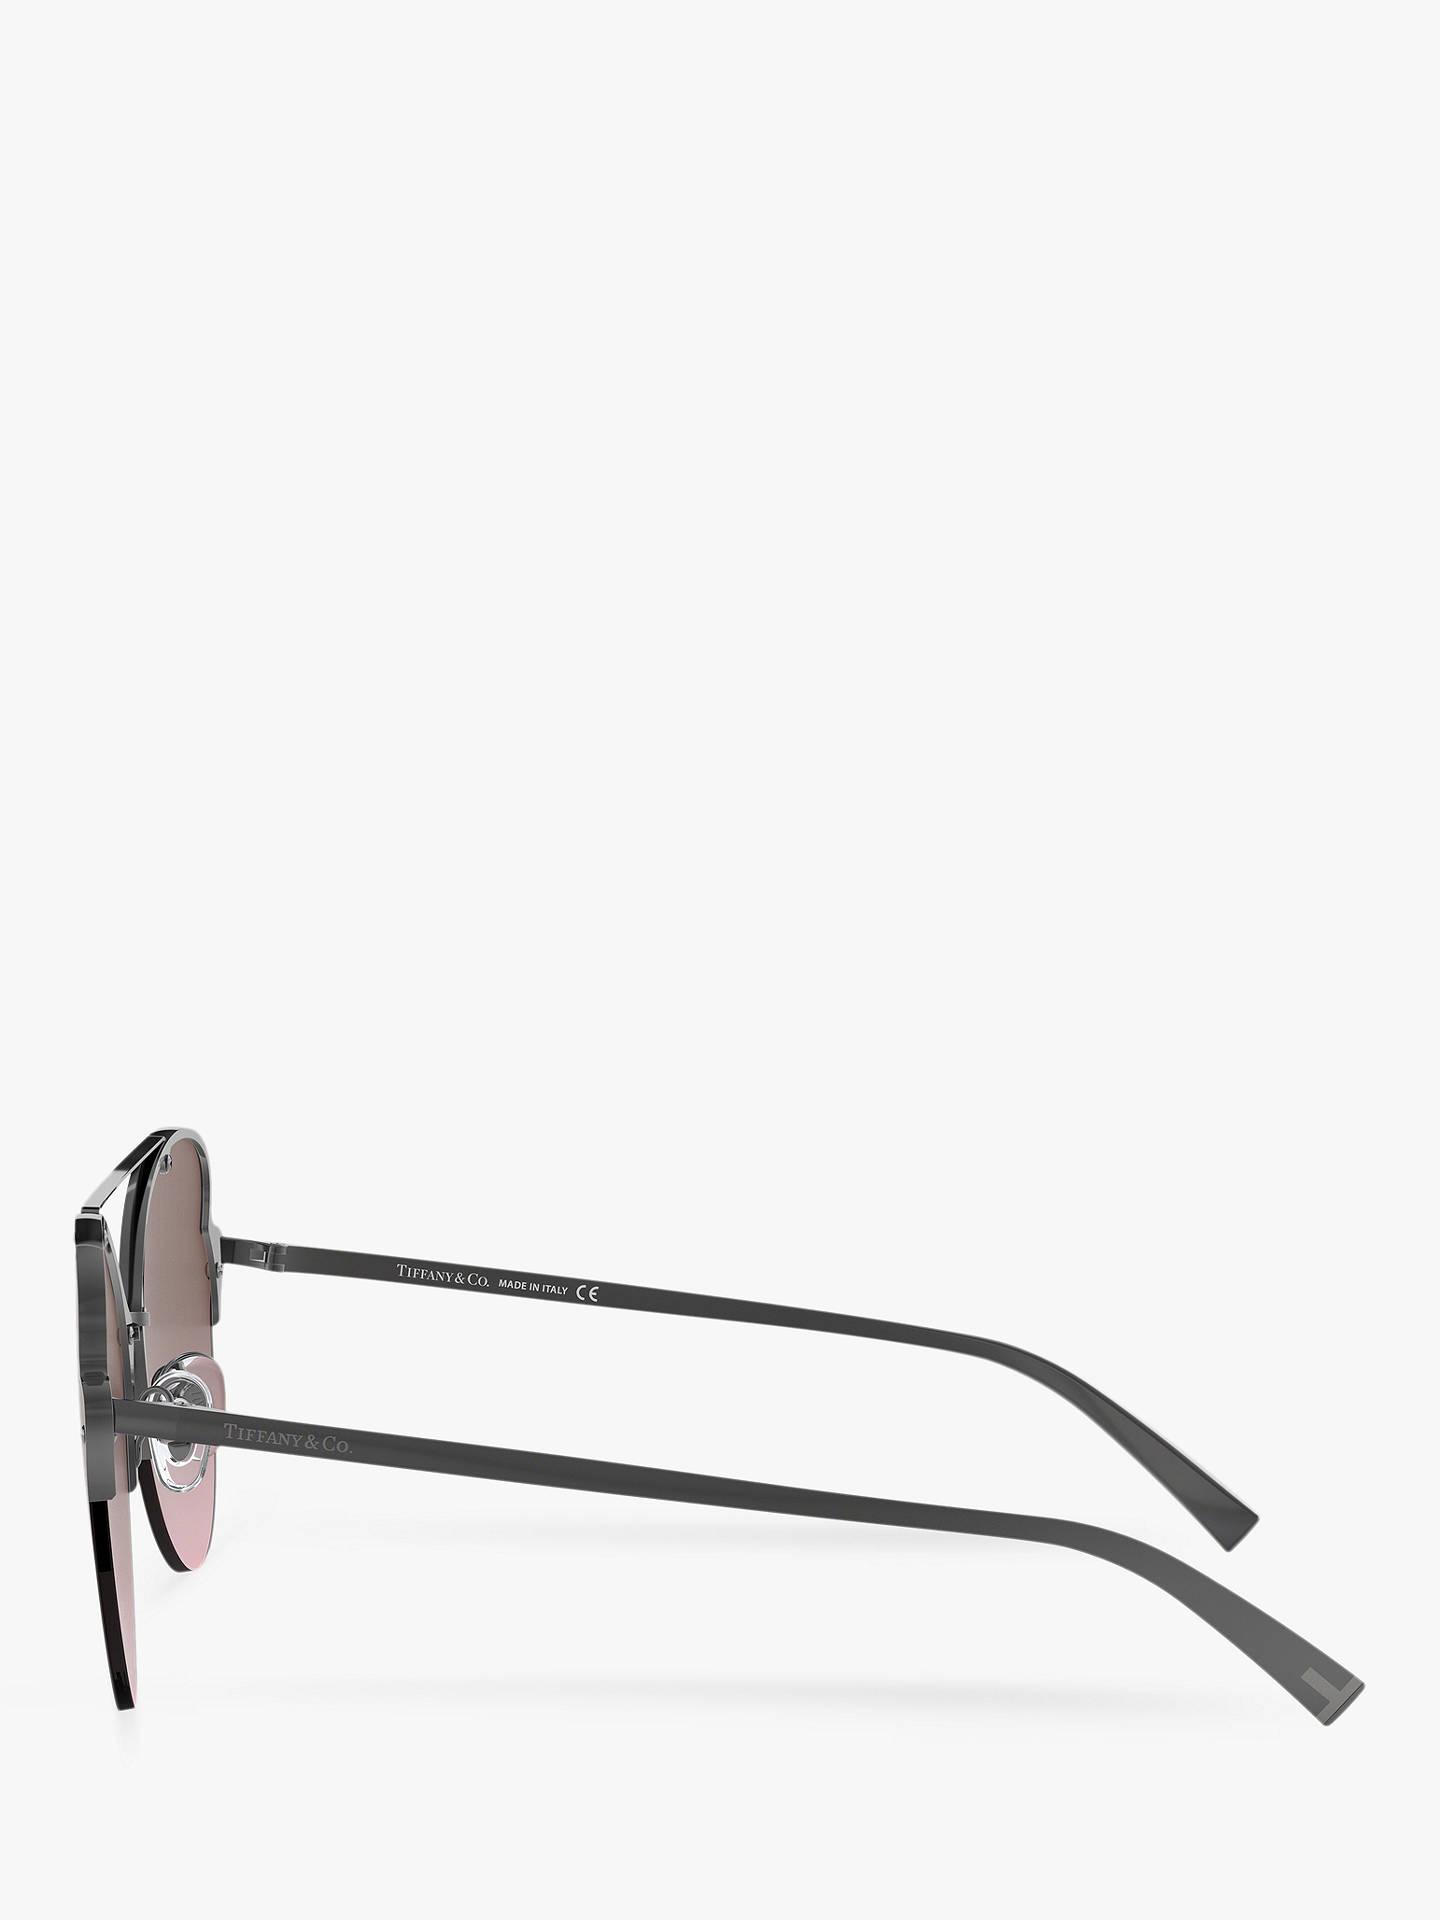 793c649a02f0 ... Buy Tiffany & Co TF3063 Women's Cat's Eye Sunglasses, Gunmetal/Purple  Gradient Online at ...